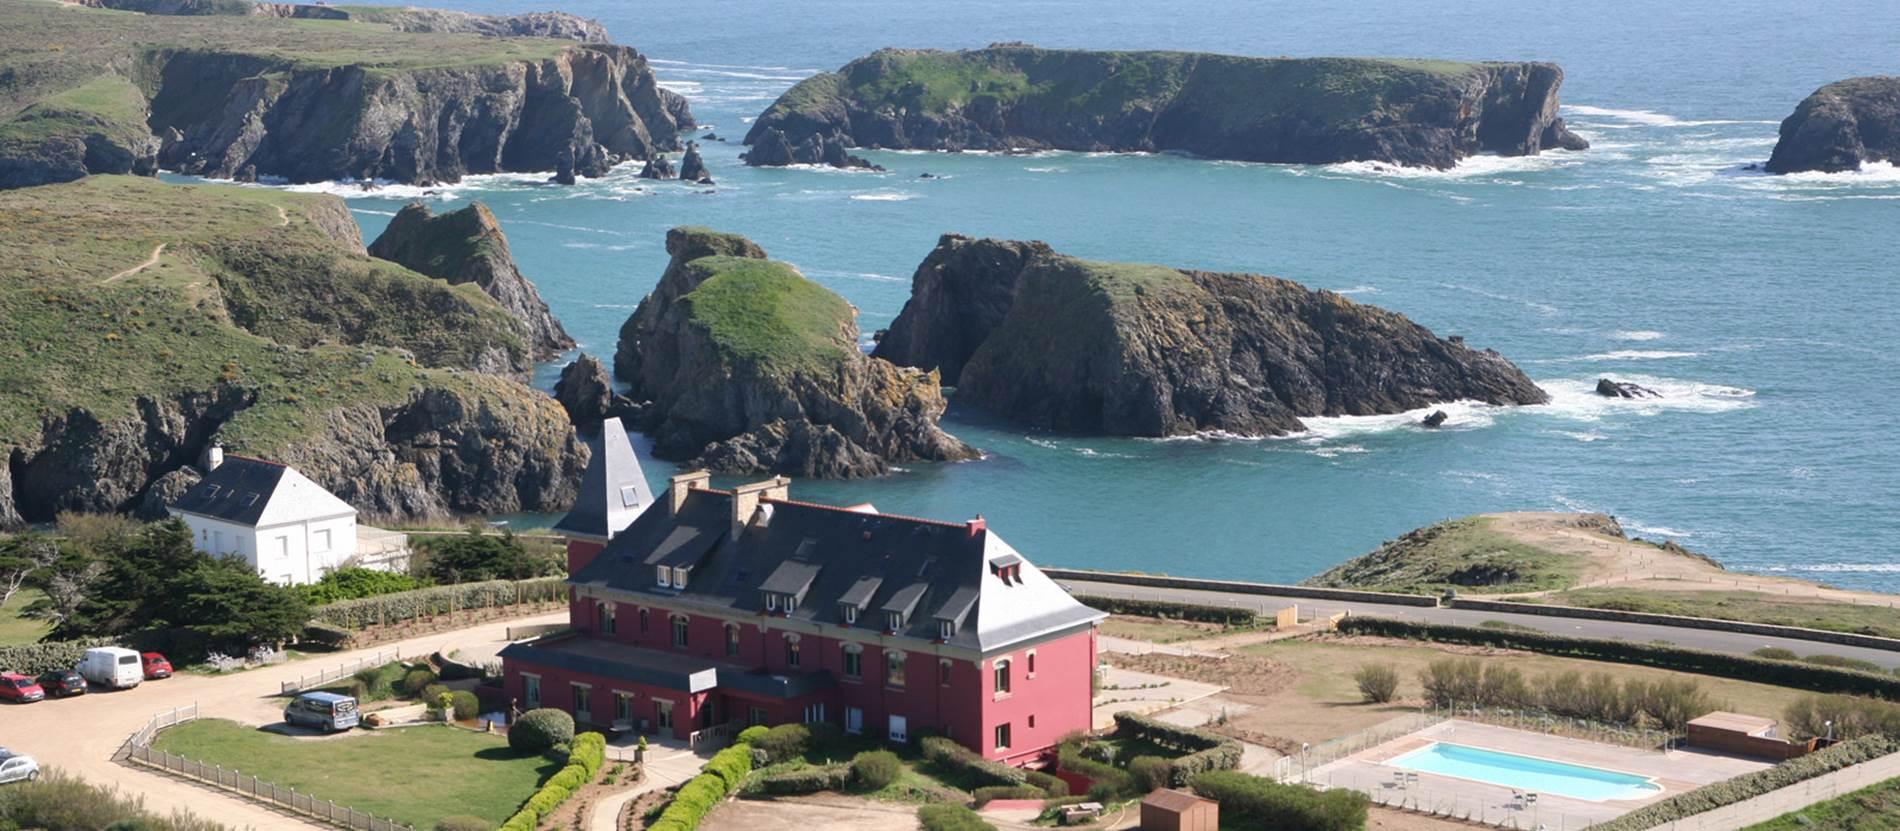 Hotel-Restaurant-Le-Grand-Large-Bangor-Morbihan-Bretagne-Sud © Hotel-Restaurant-Le-Grand-Large-Bangor-Morbihan-Bretagne-Sud